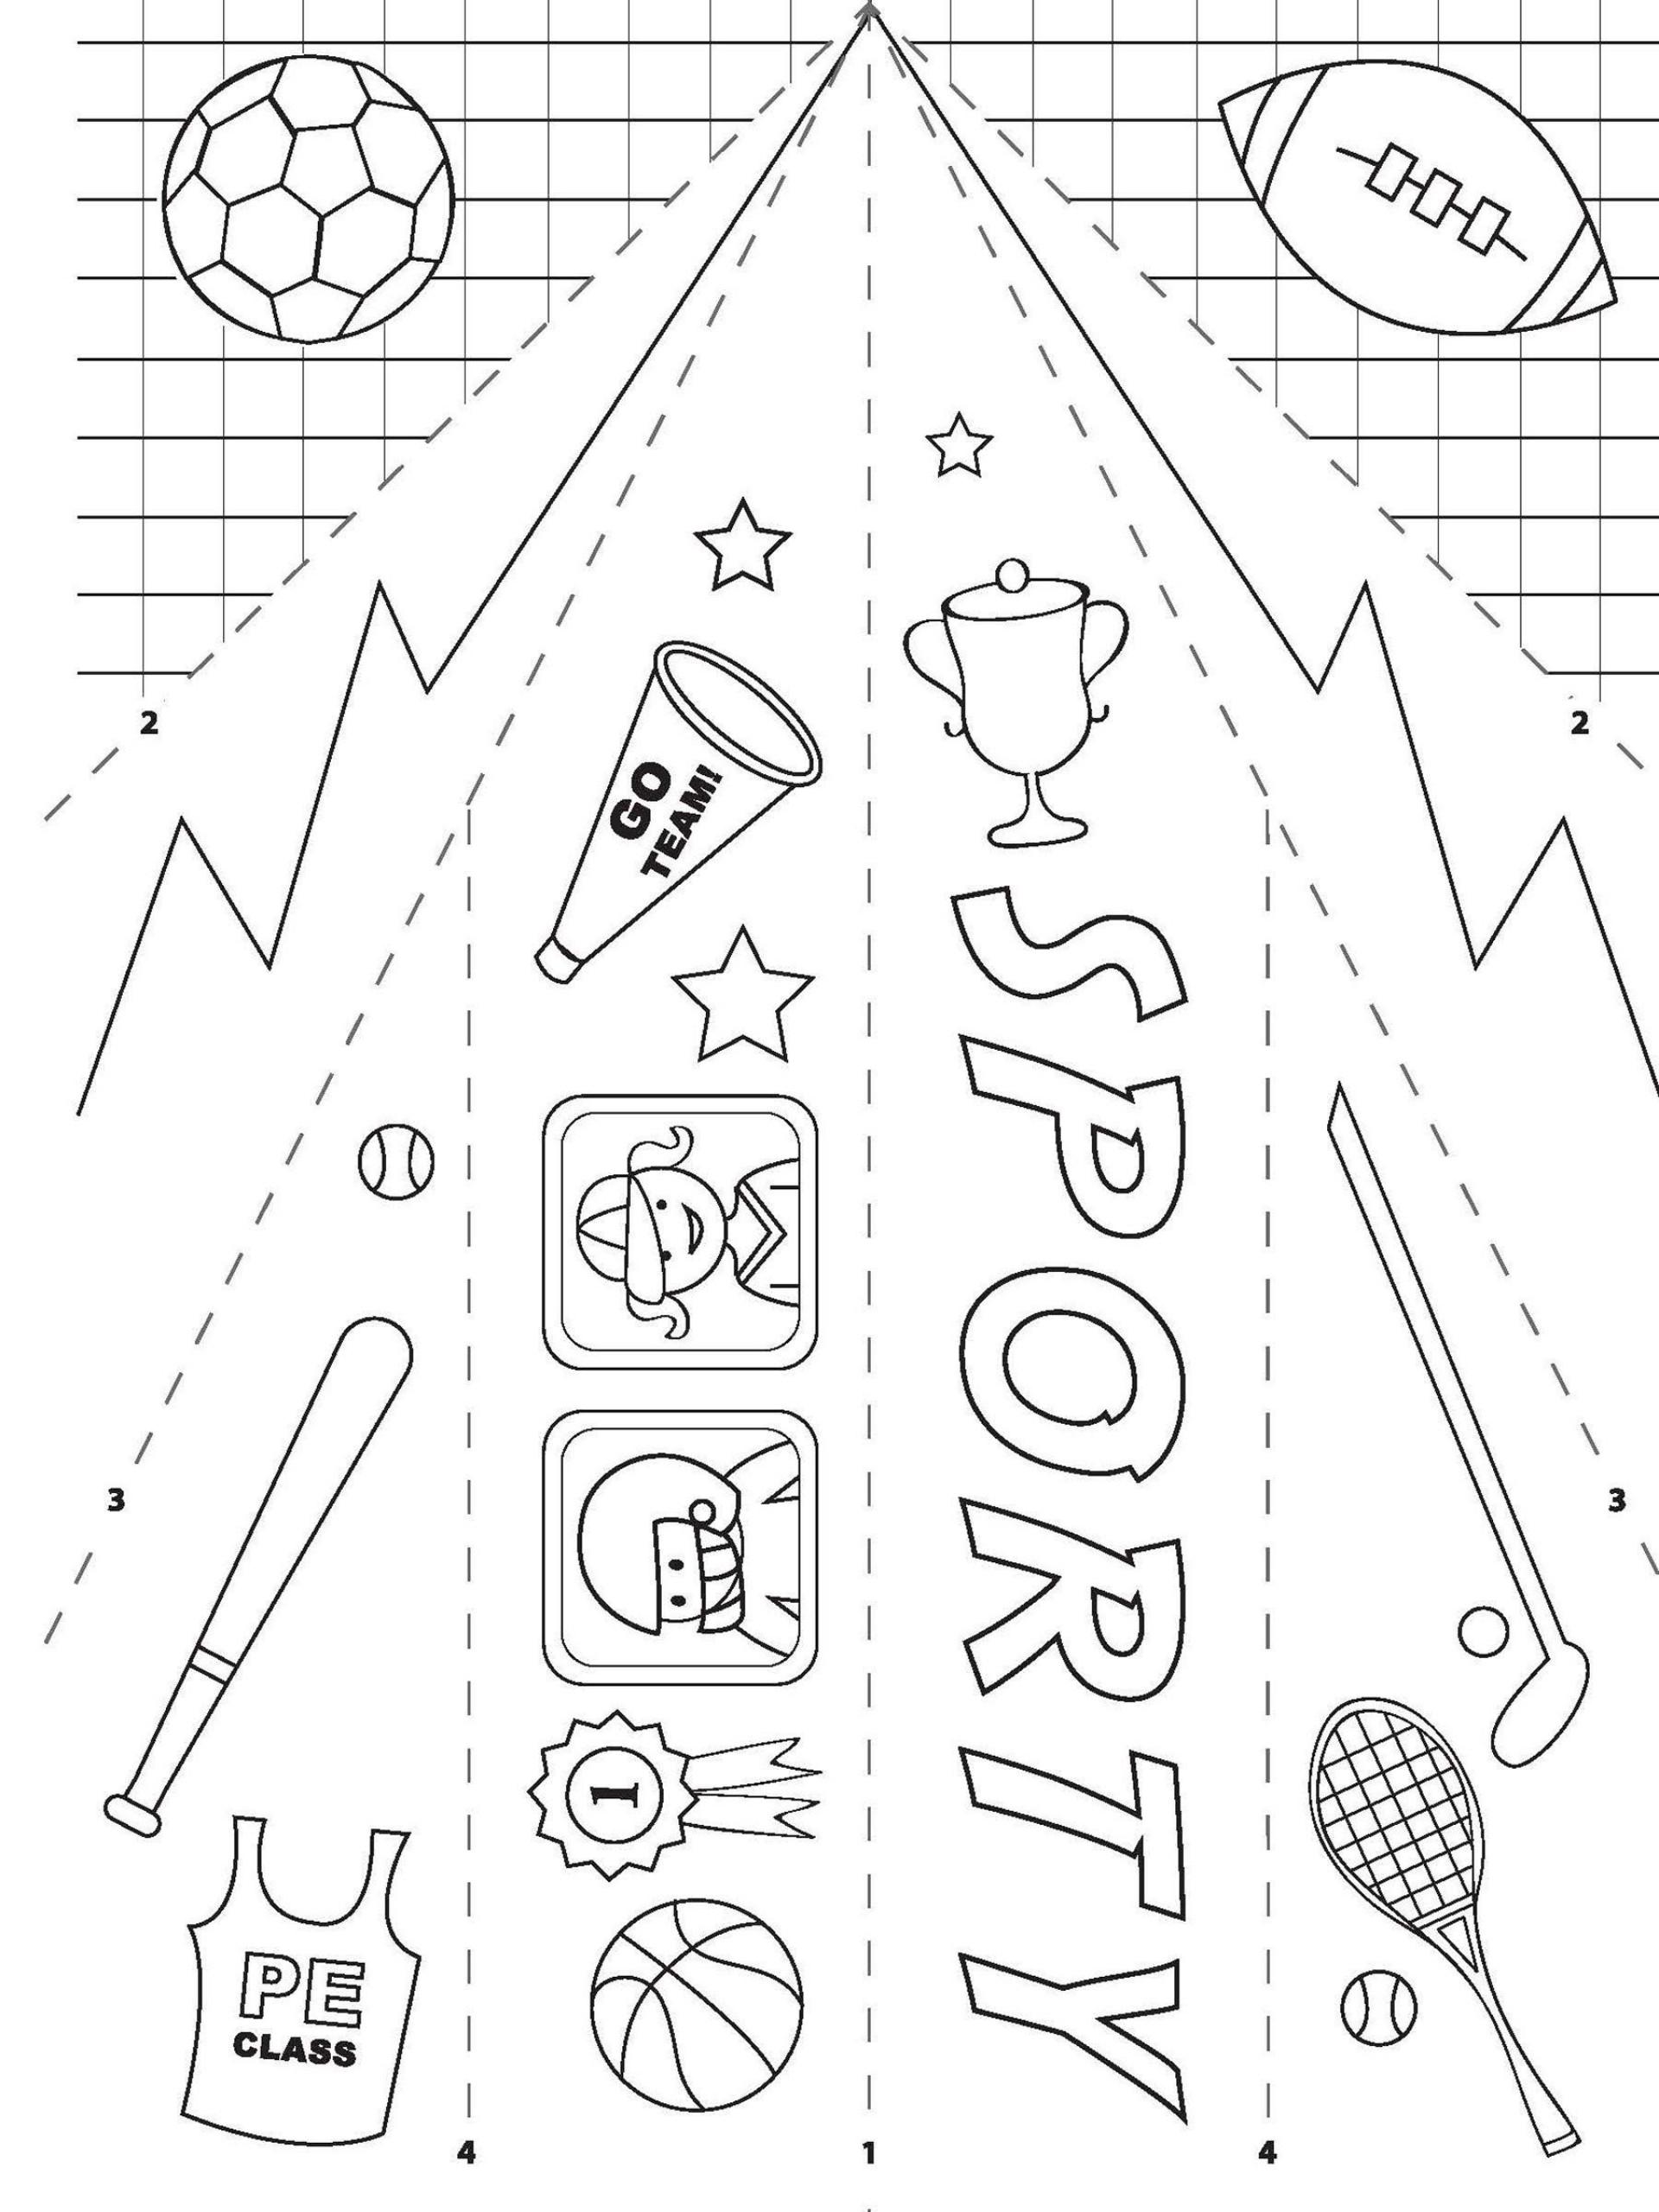 000 Incredible Free Paper Airplane Design Printable Template High Def  Designs-printable Templates1920